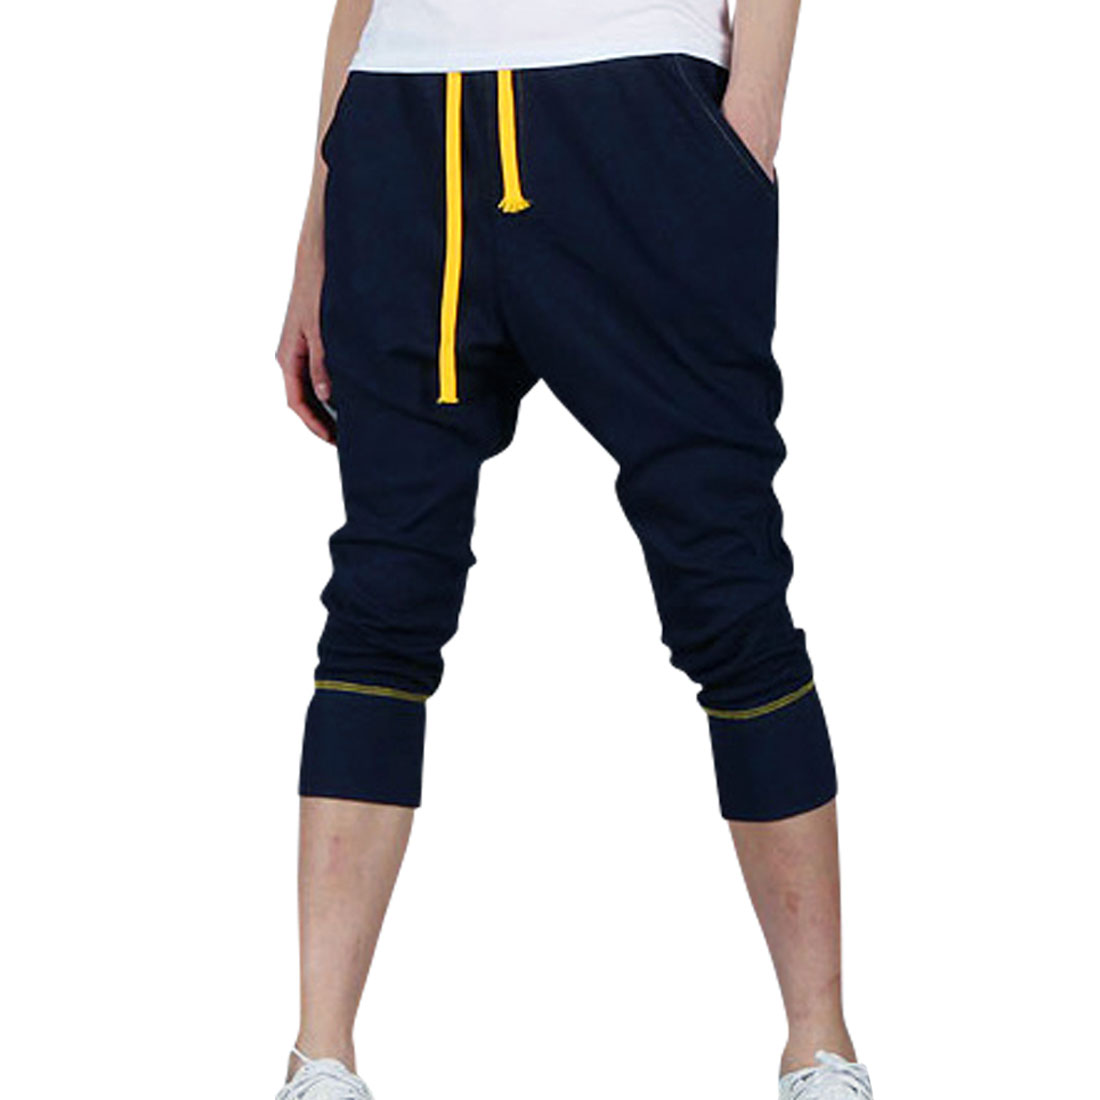 Men Pockets Stretchy Adjustable Drawstring Capris Pants Dark Blue W28